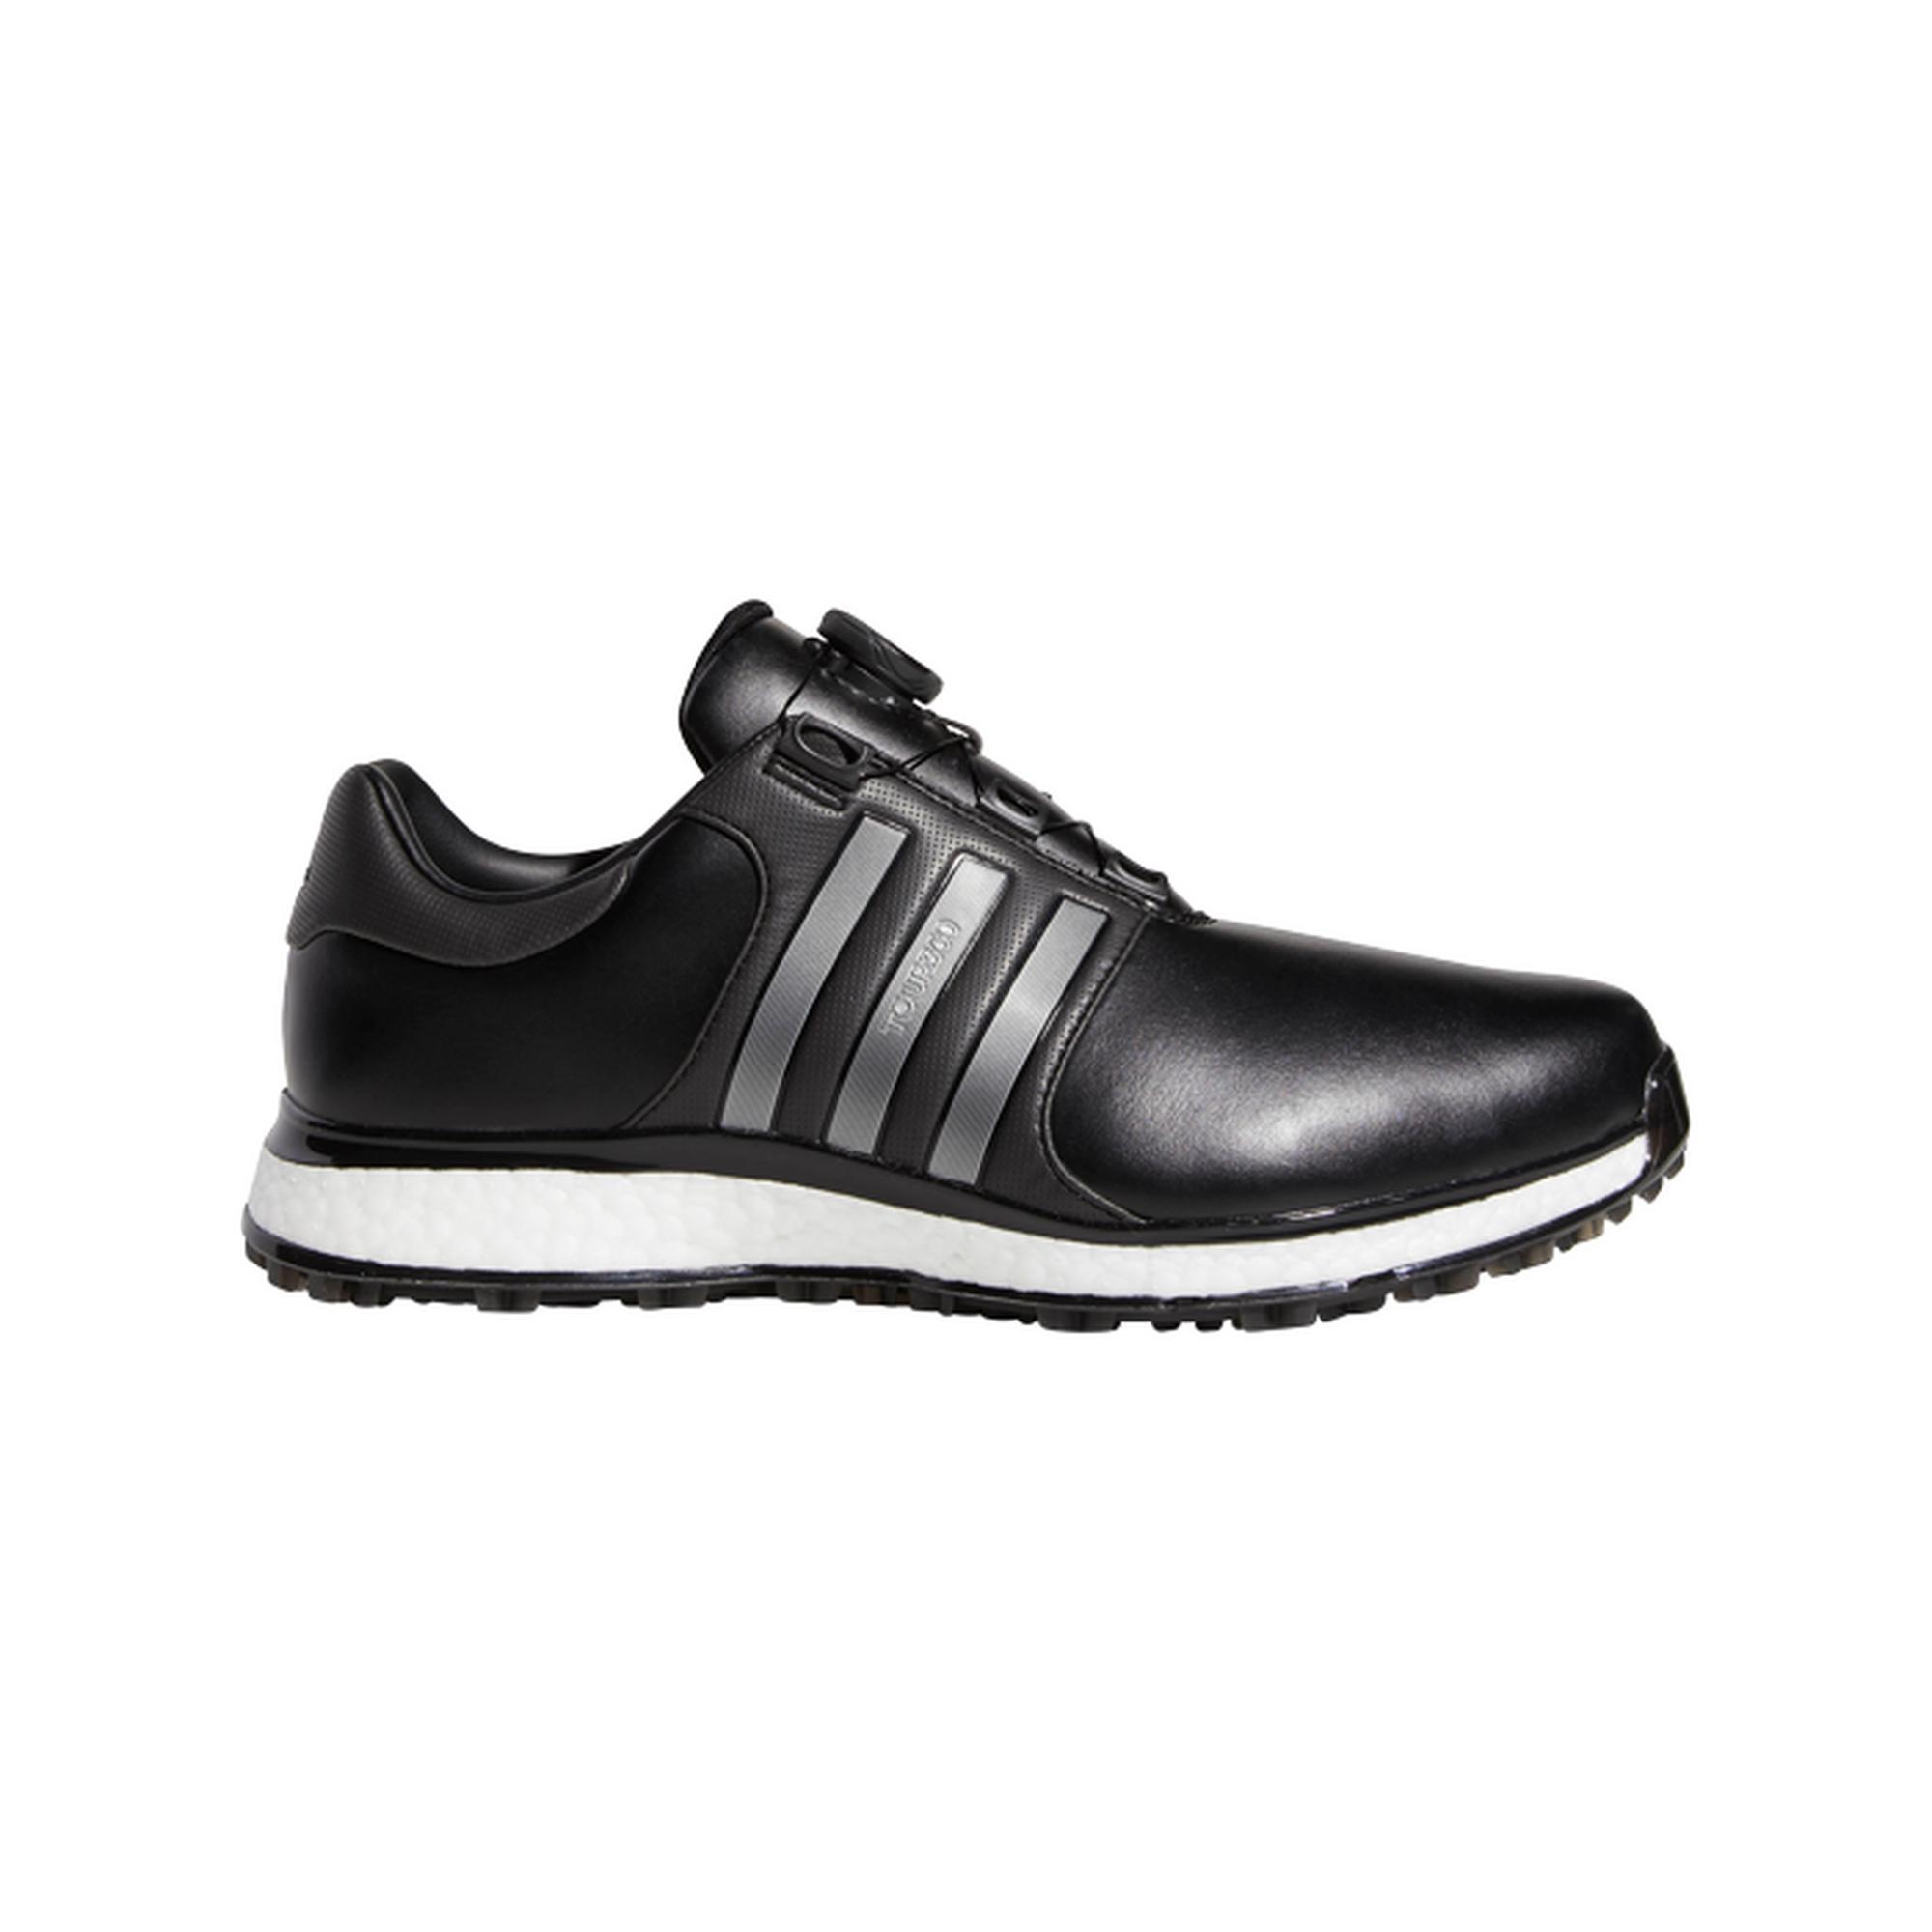 Men's Tour360 XT Boa Spikeless Golf Shoe - BLACK/SILVER/WHITE